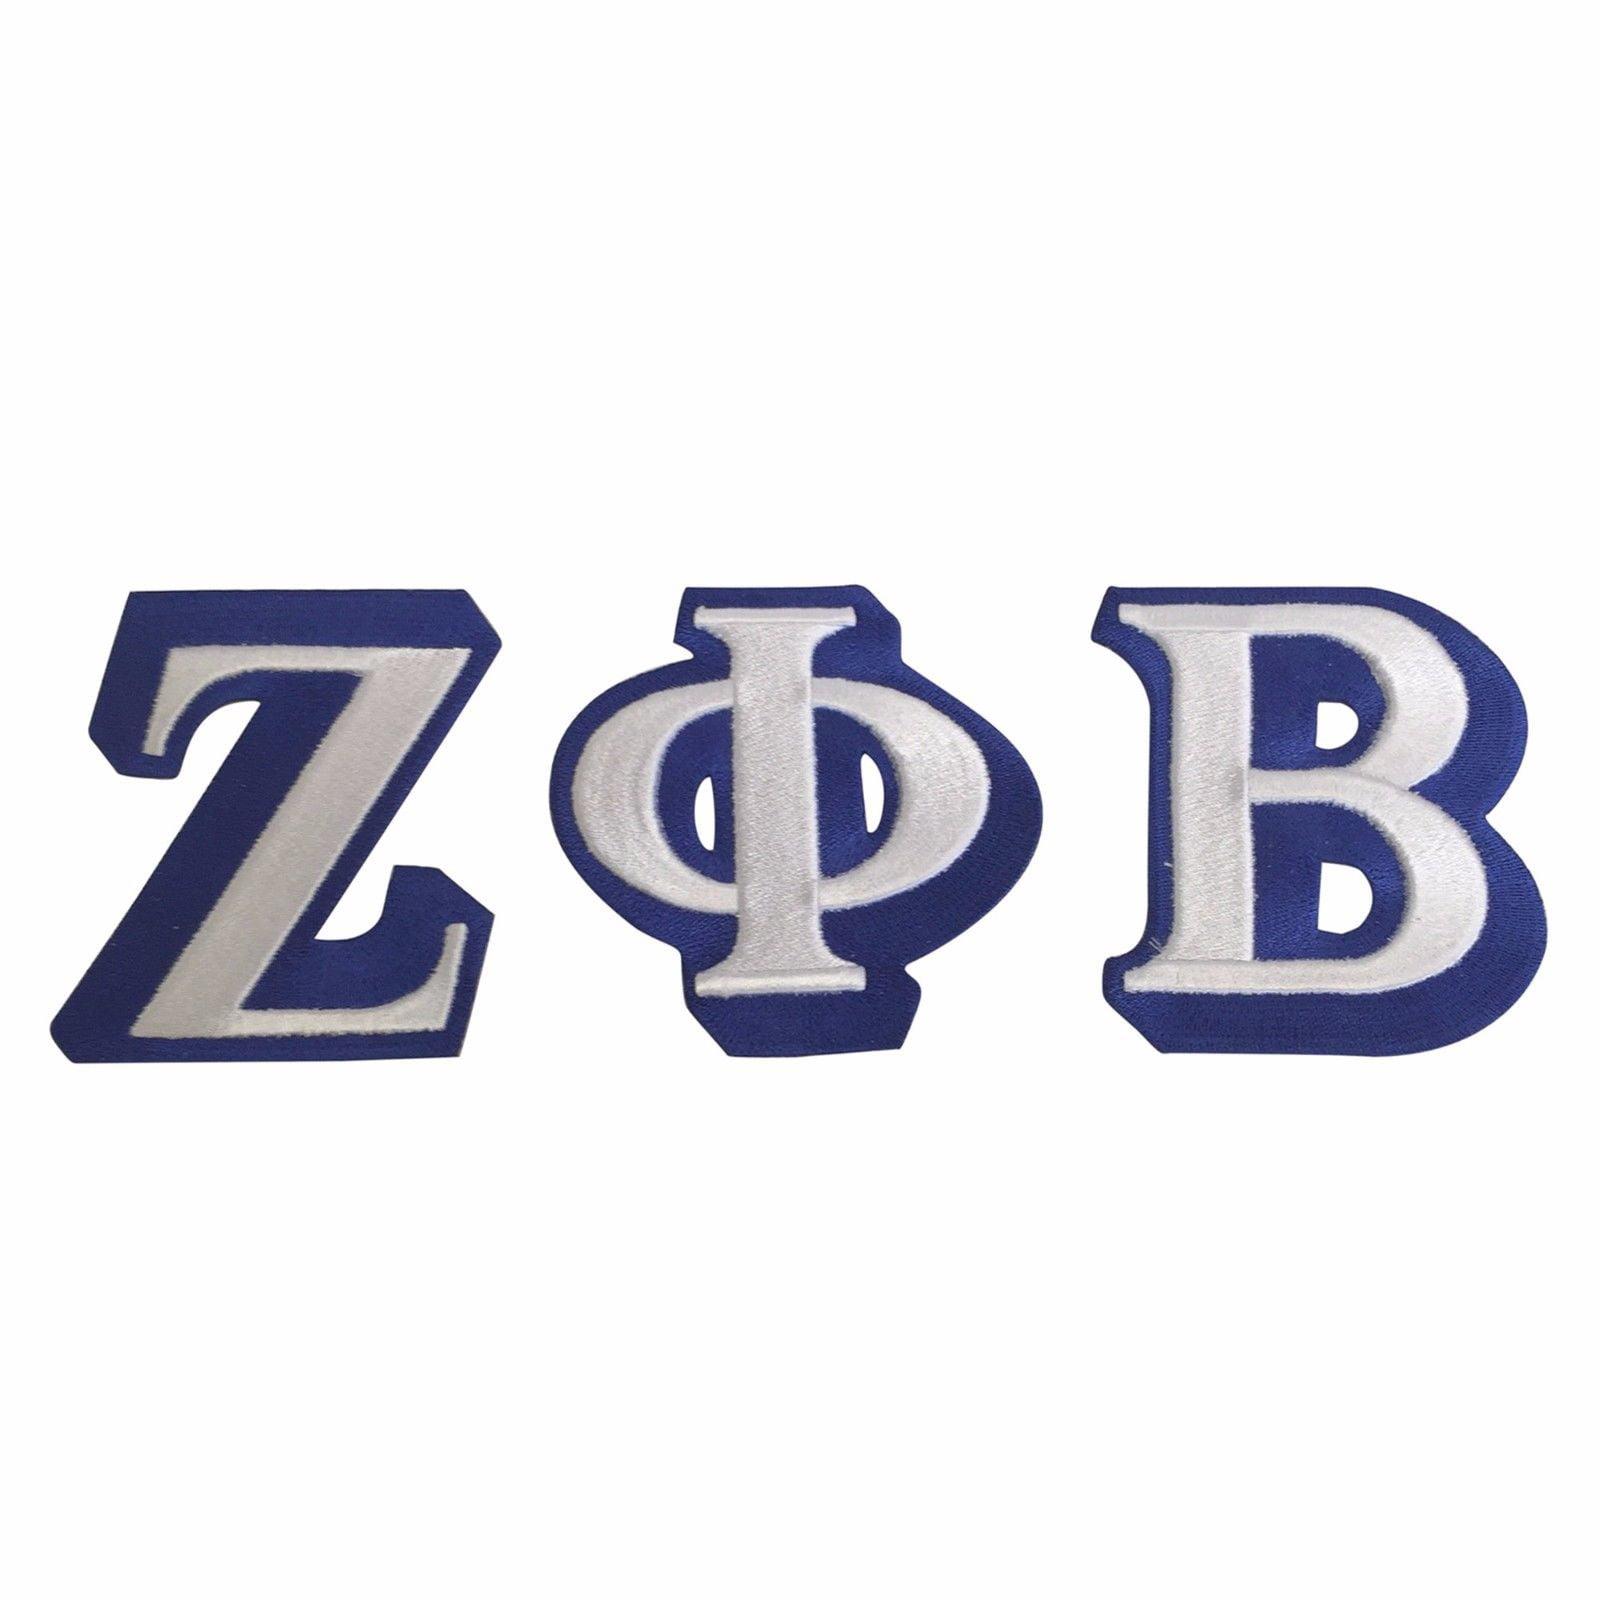 Zeta phi beta letters